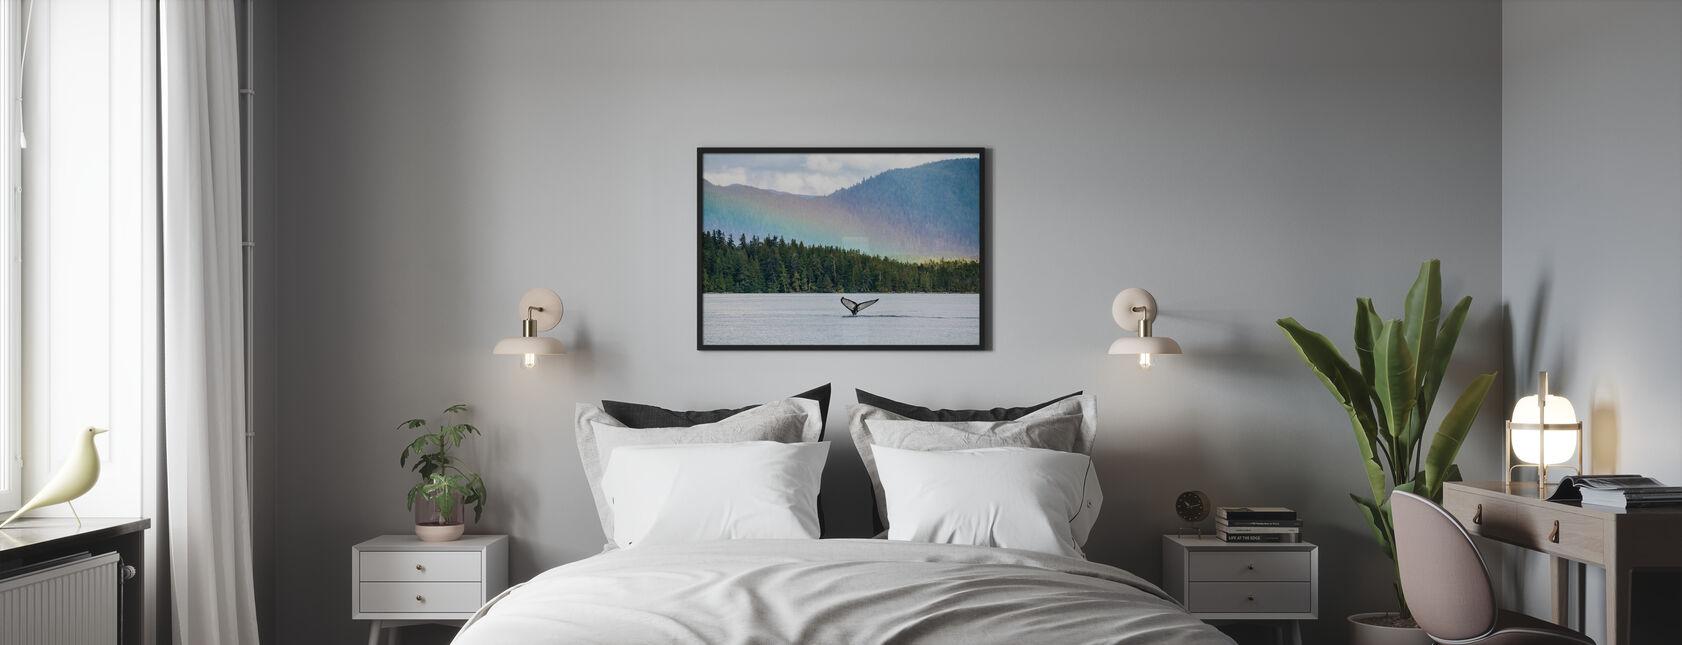 Baleine à bosse - Impression encadree - Chambre